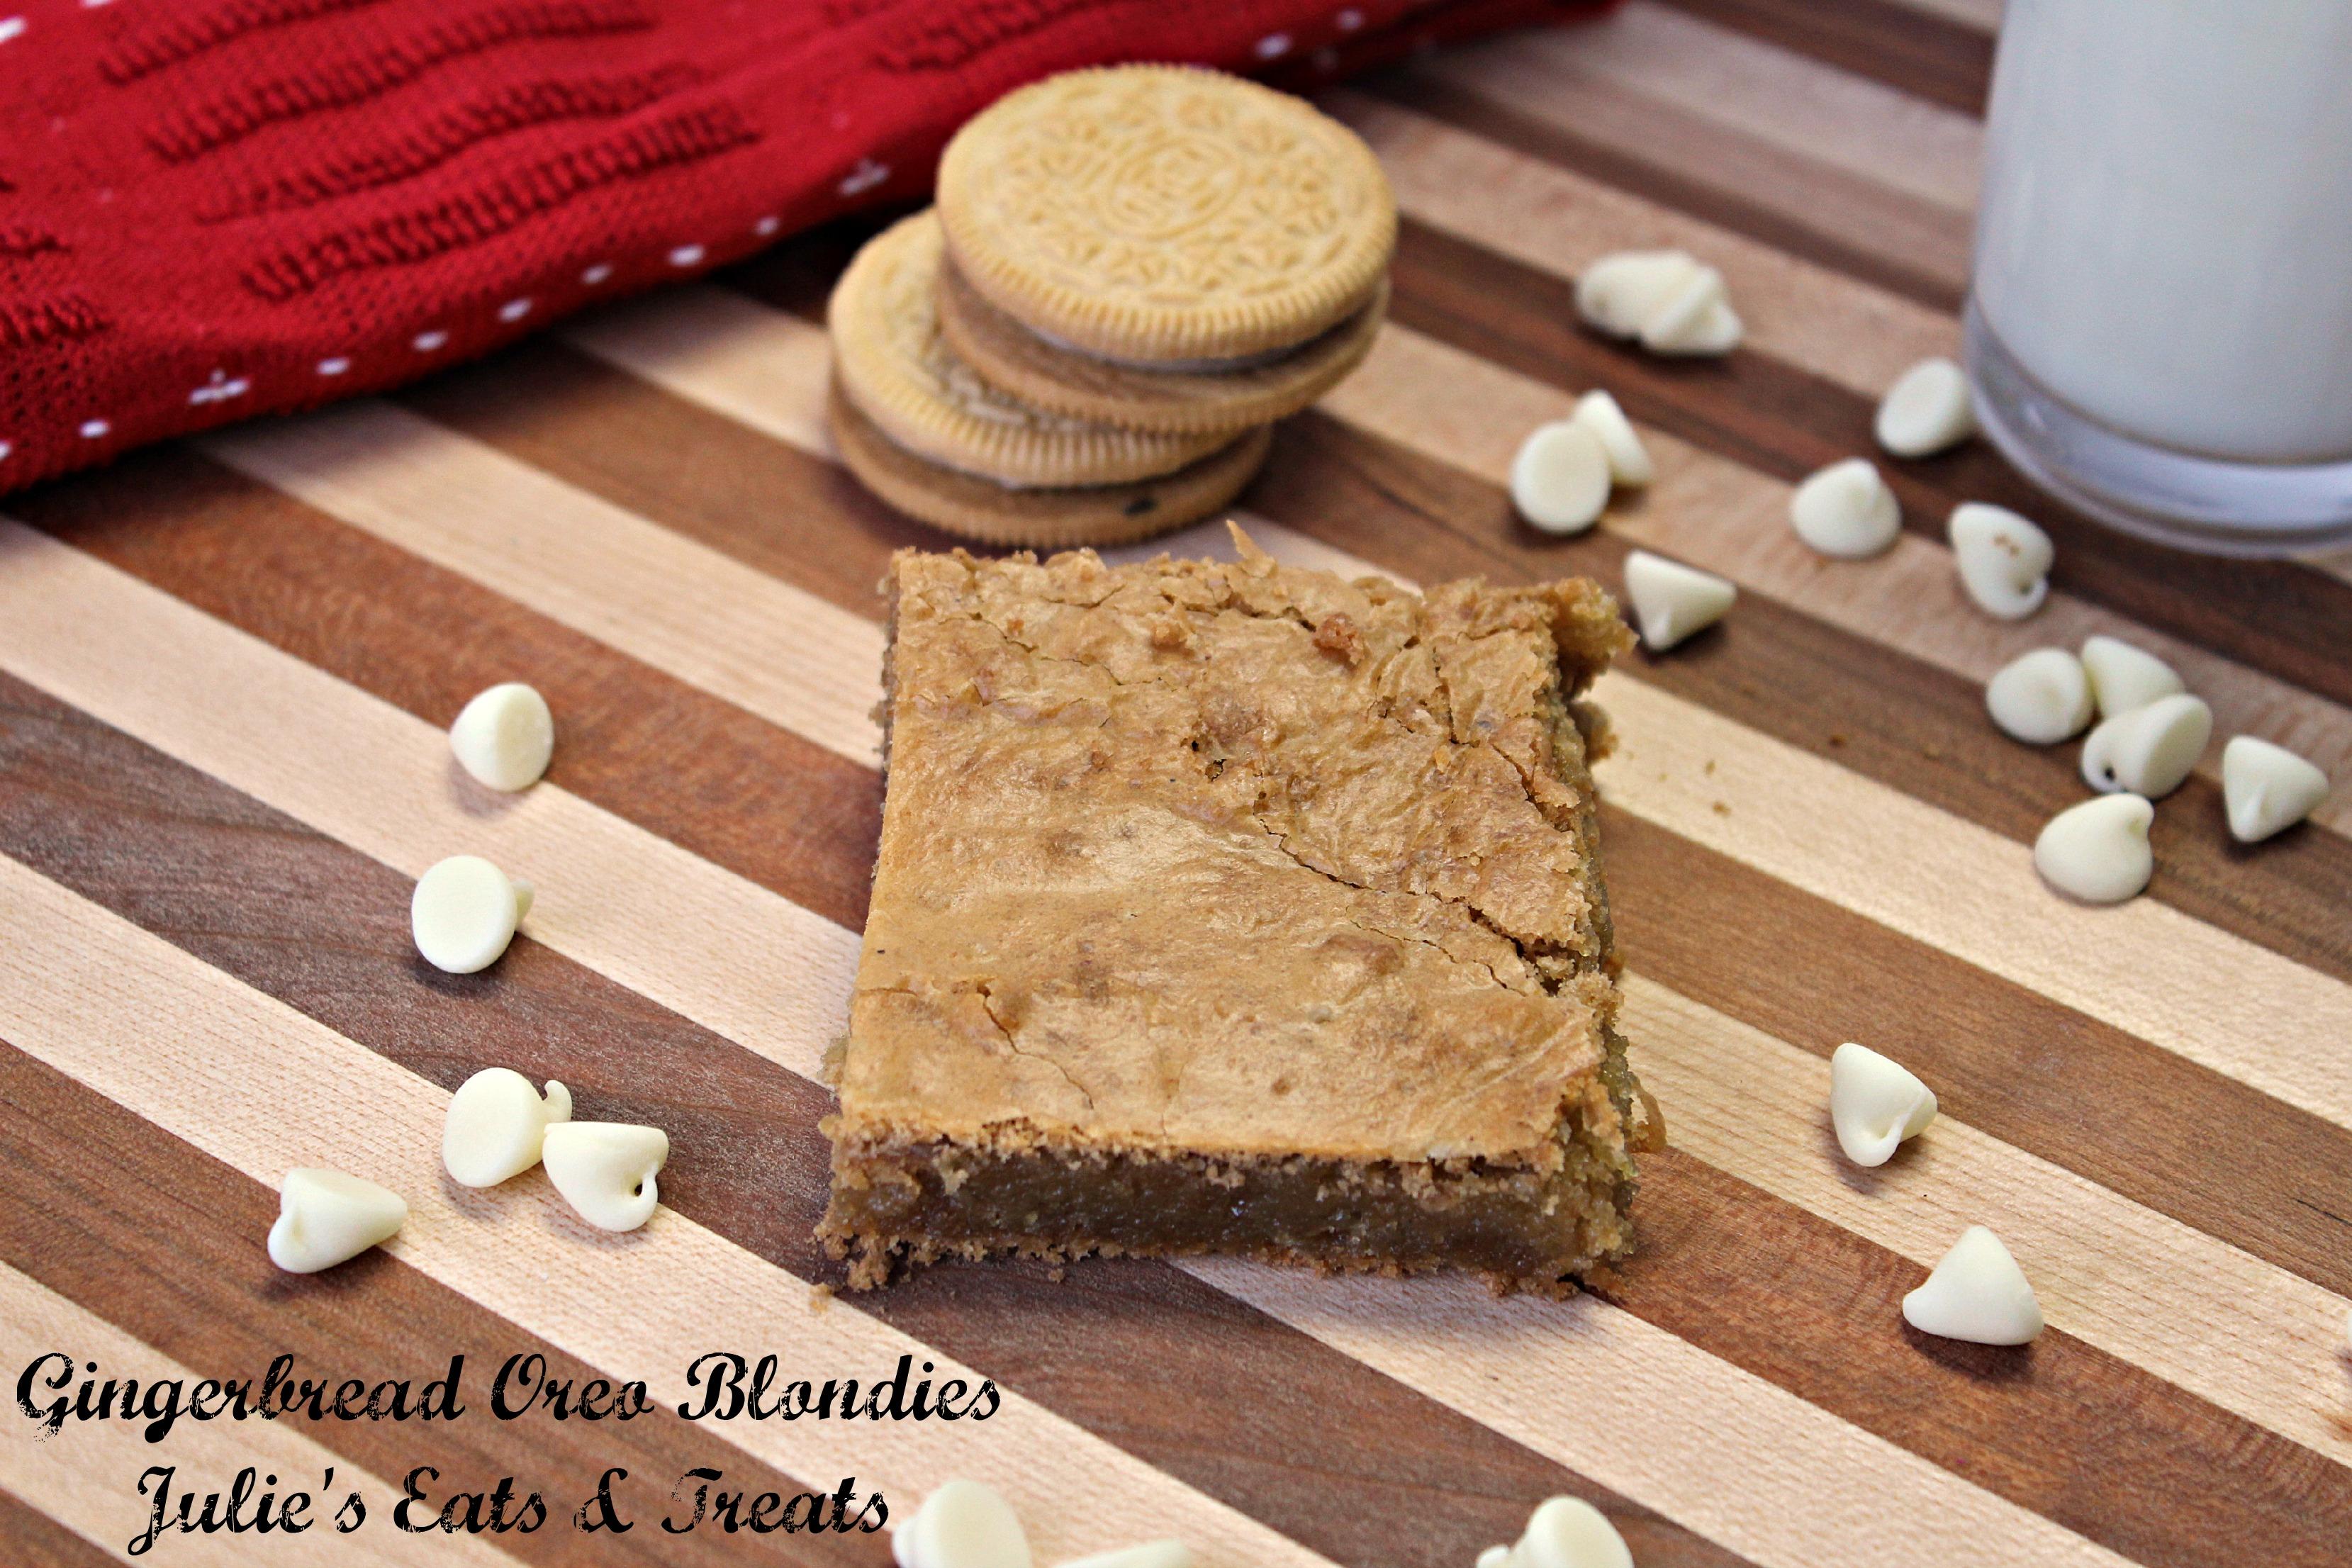 Gingerbread Oreo Blondies - Julie's Eats & Treats